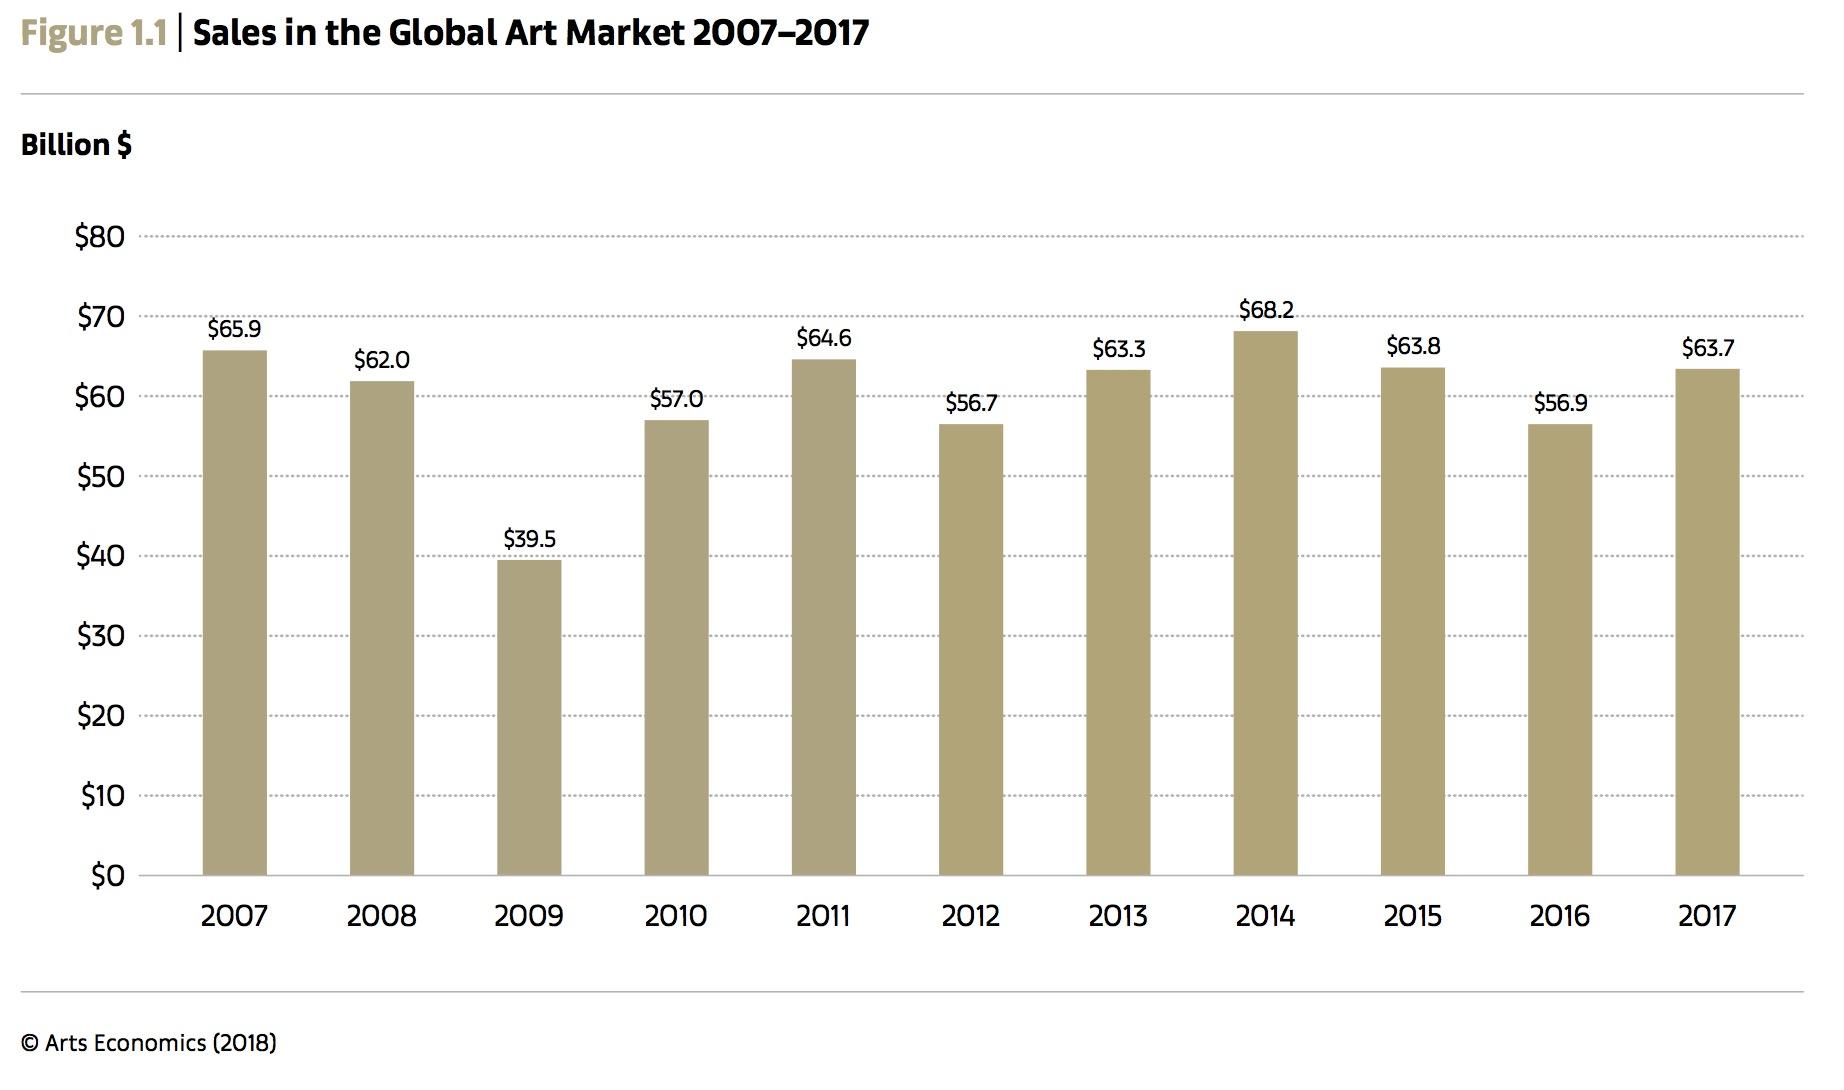 Art Market Grew To 637 Billion In 2017 And Other Key Takeaways